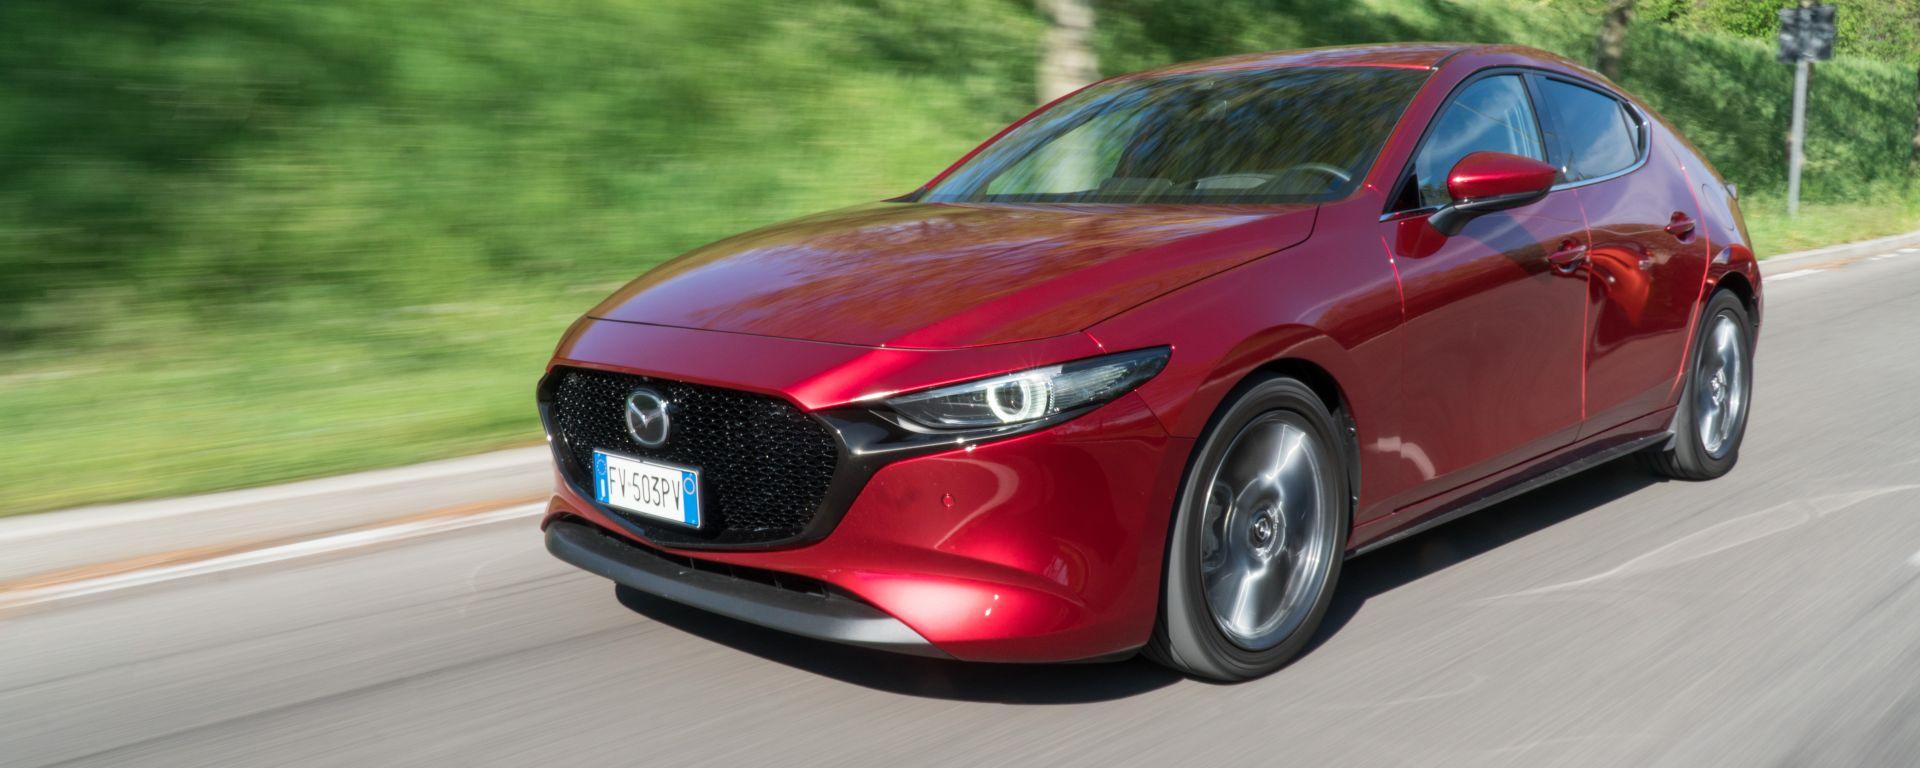 Mazda 3 Skyactiv-D: bella da vedere e da guidare